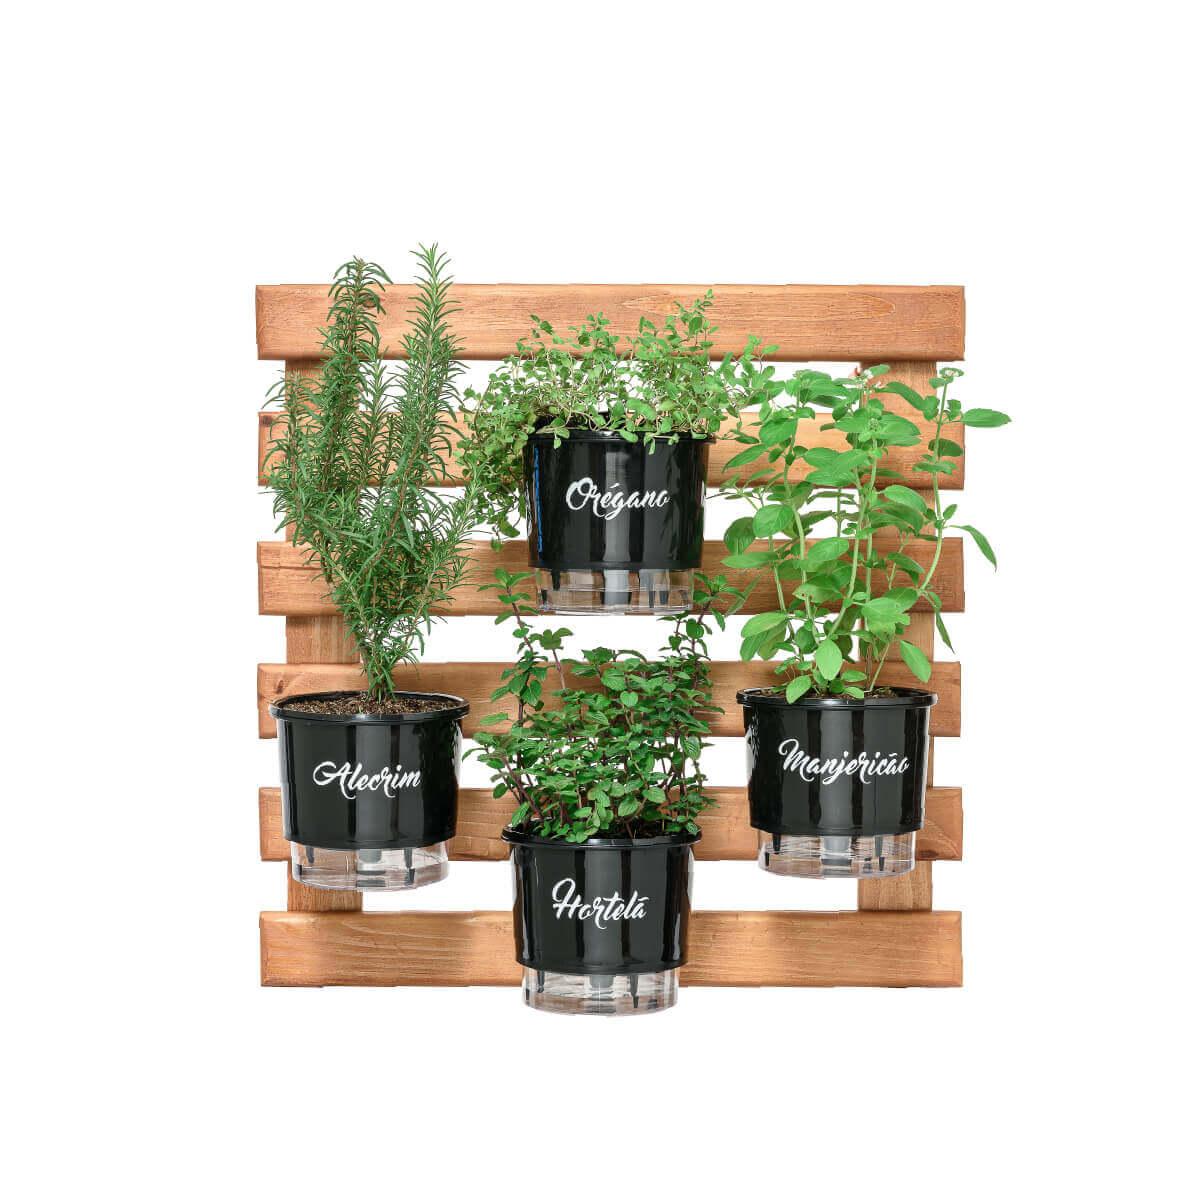 Horta Vertical Caramelo 60cm x 60cm com 4 Vasos Gourmet  - Loja Raiz